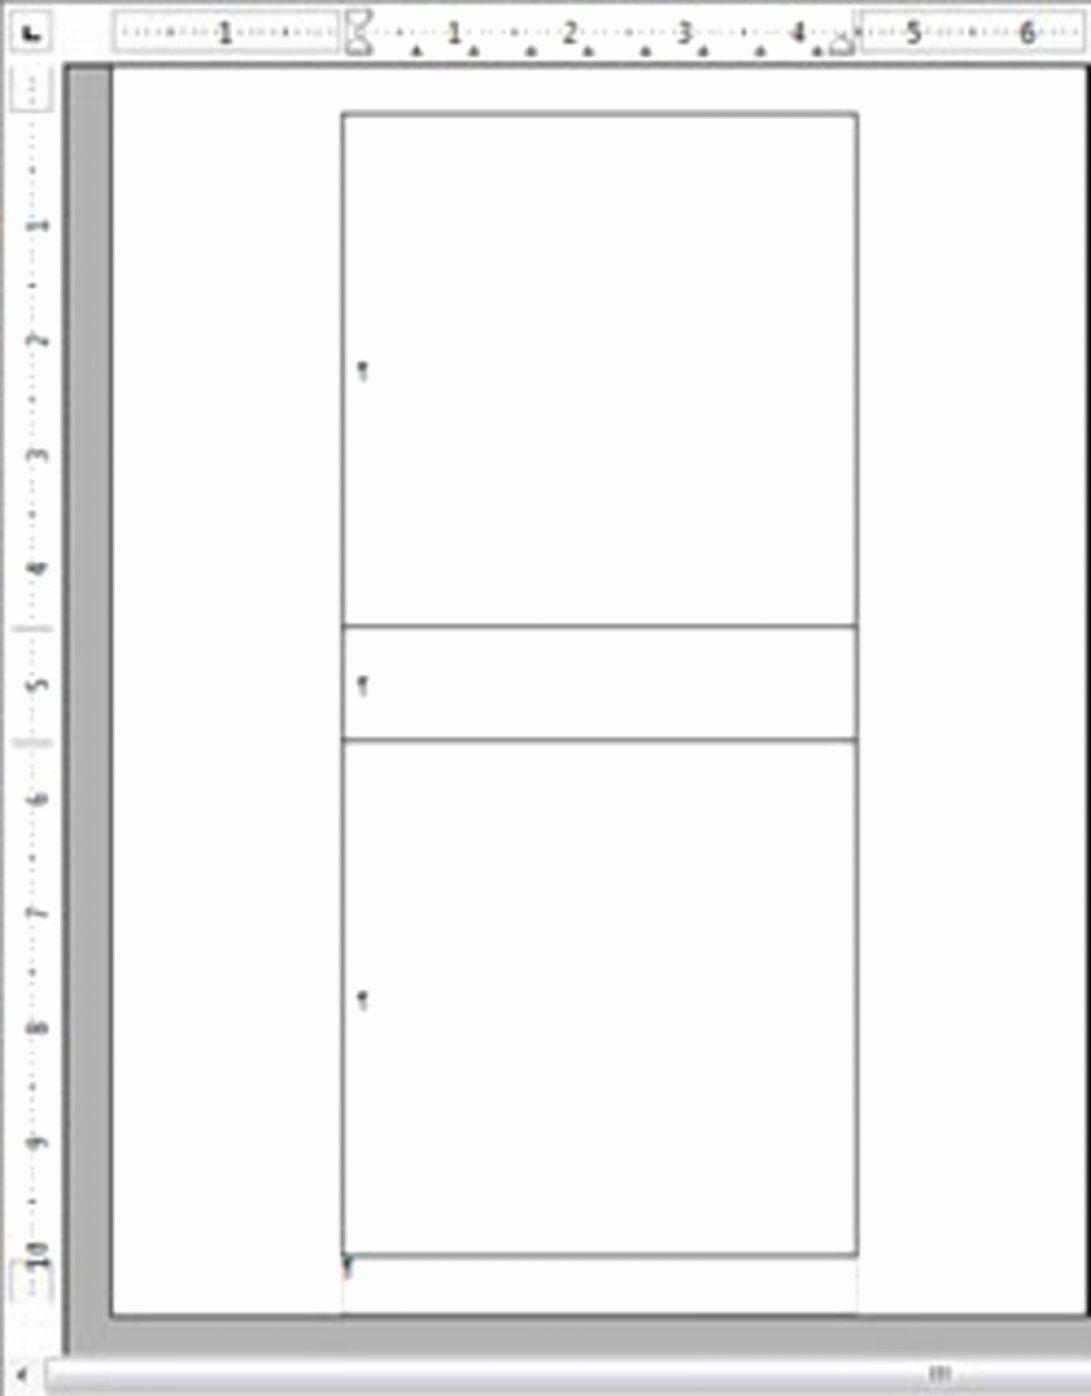 002 Impressive Microsoft Word Addres Label Template 30 Per Sheet Example Full